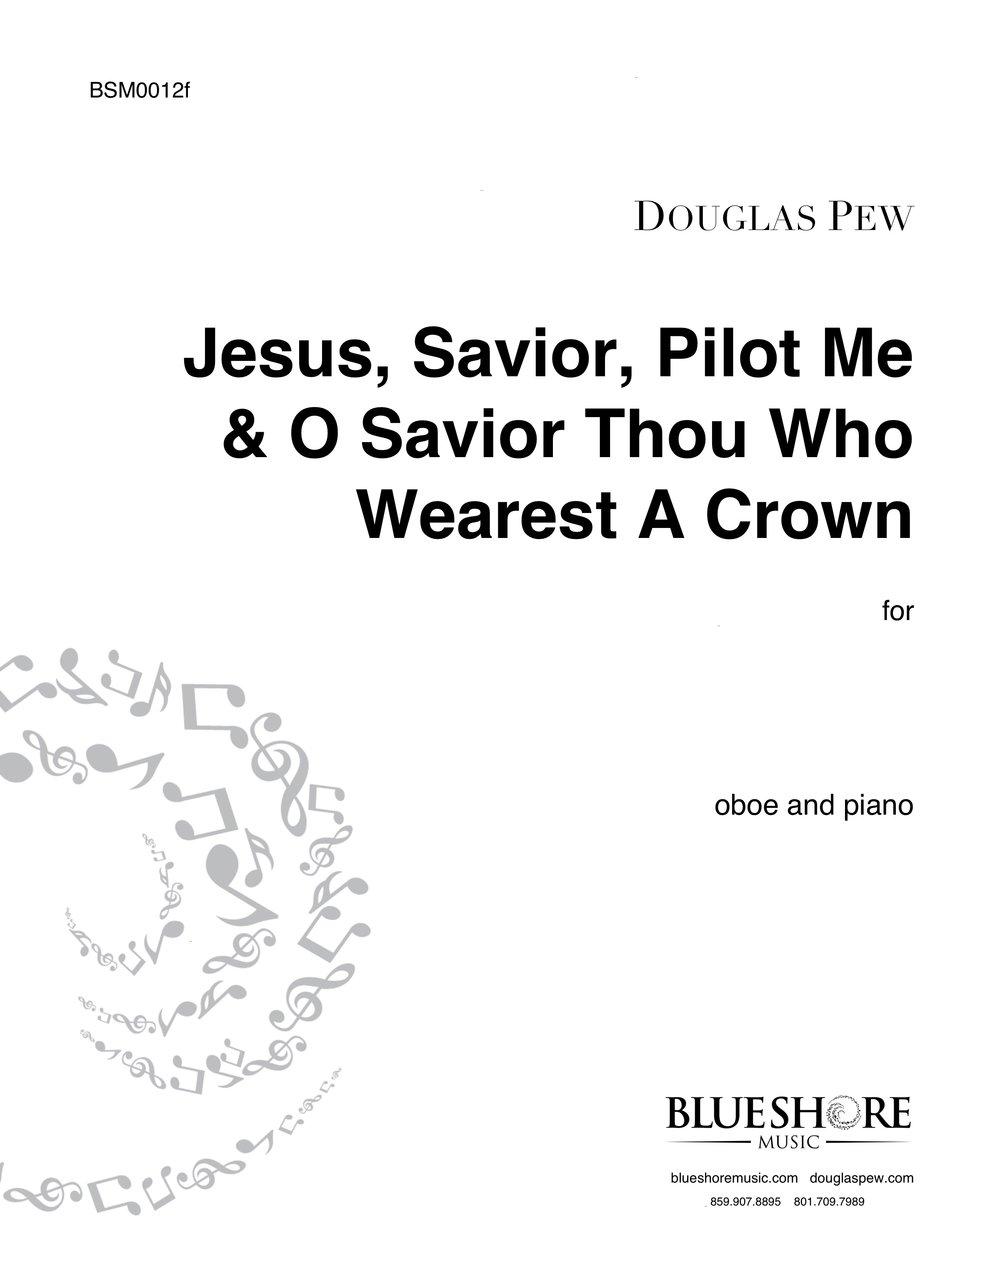 Jesus, Savior, Pilot Me and O Savior, Thou Who Wearest A Crown